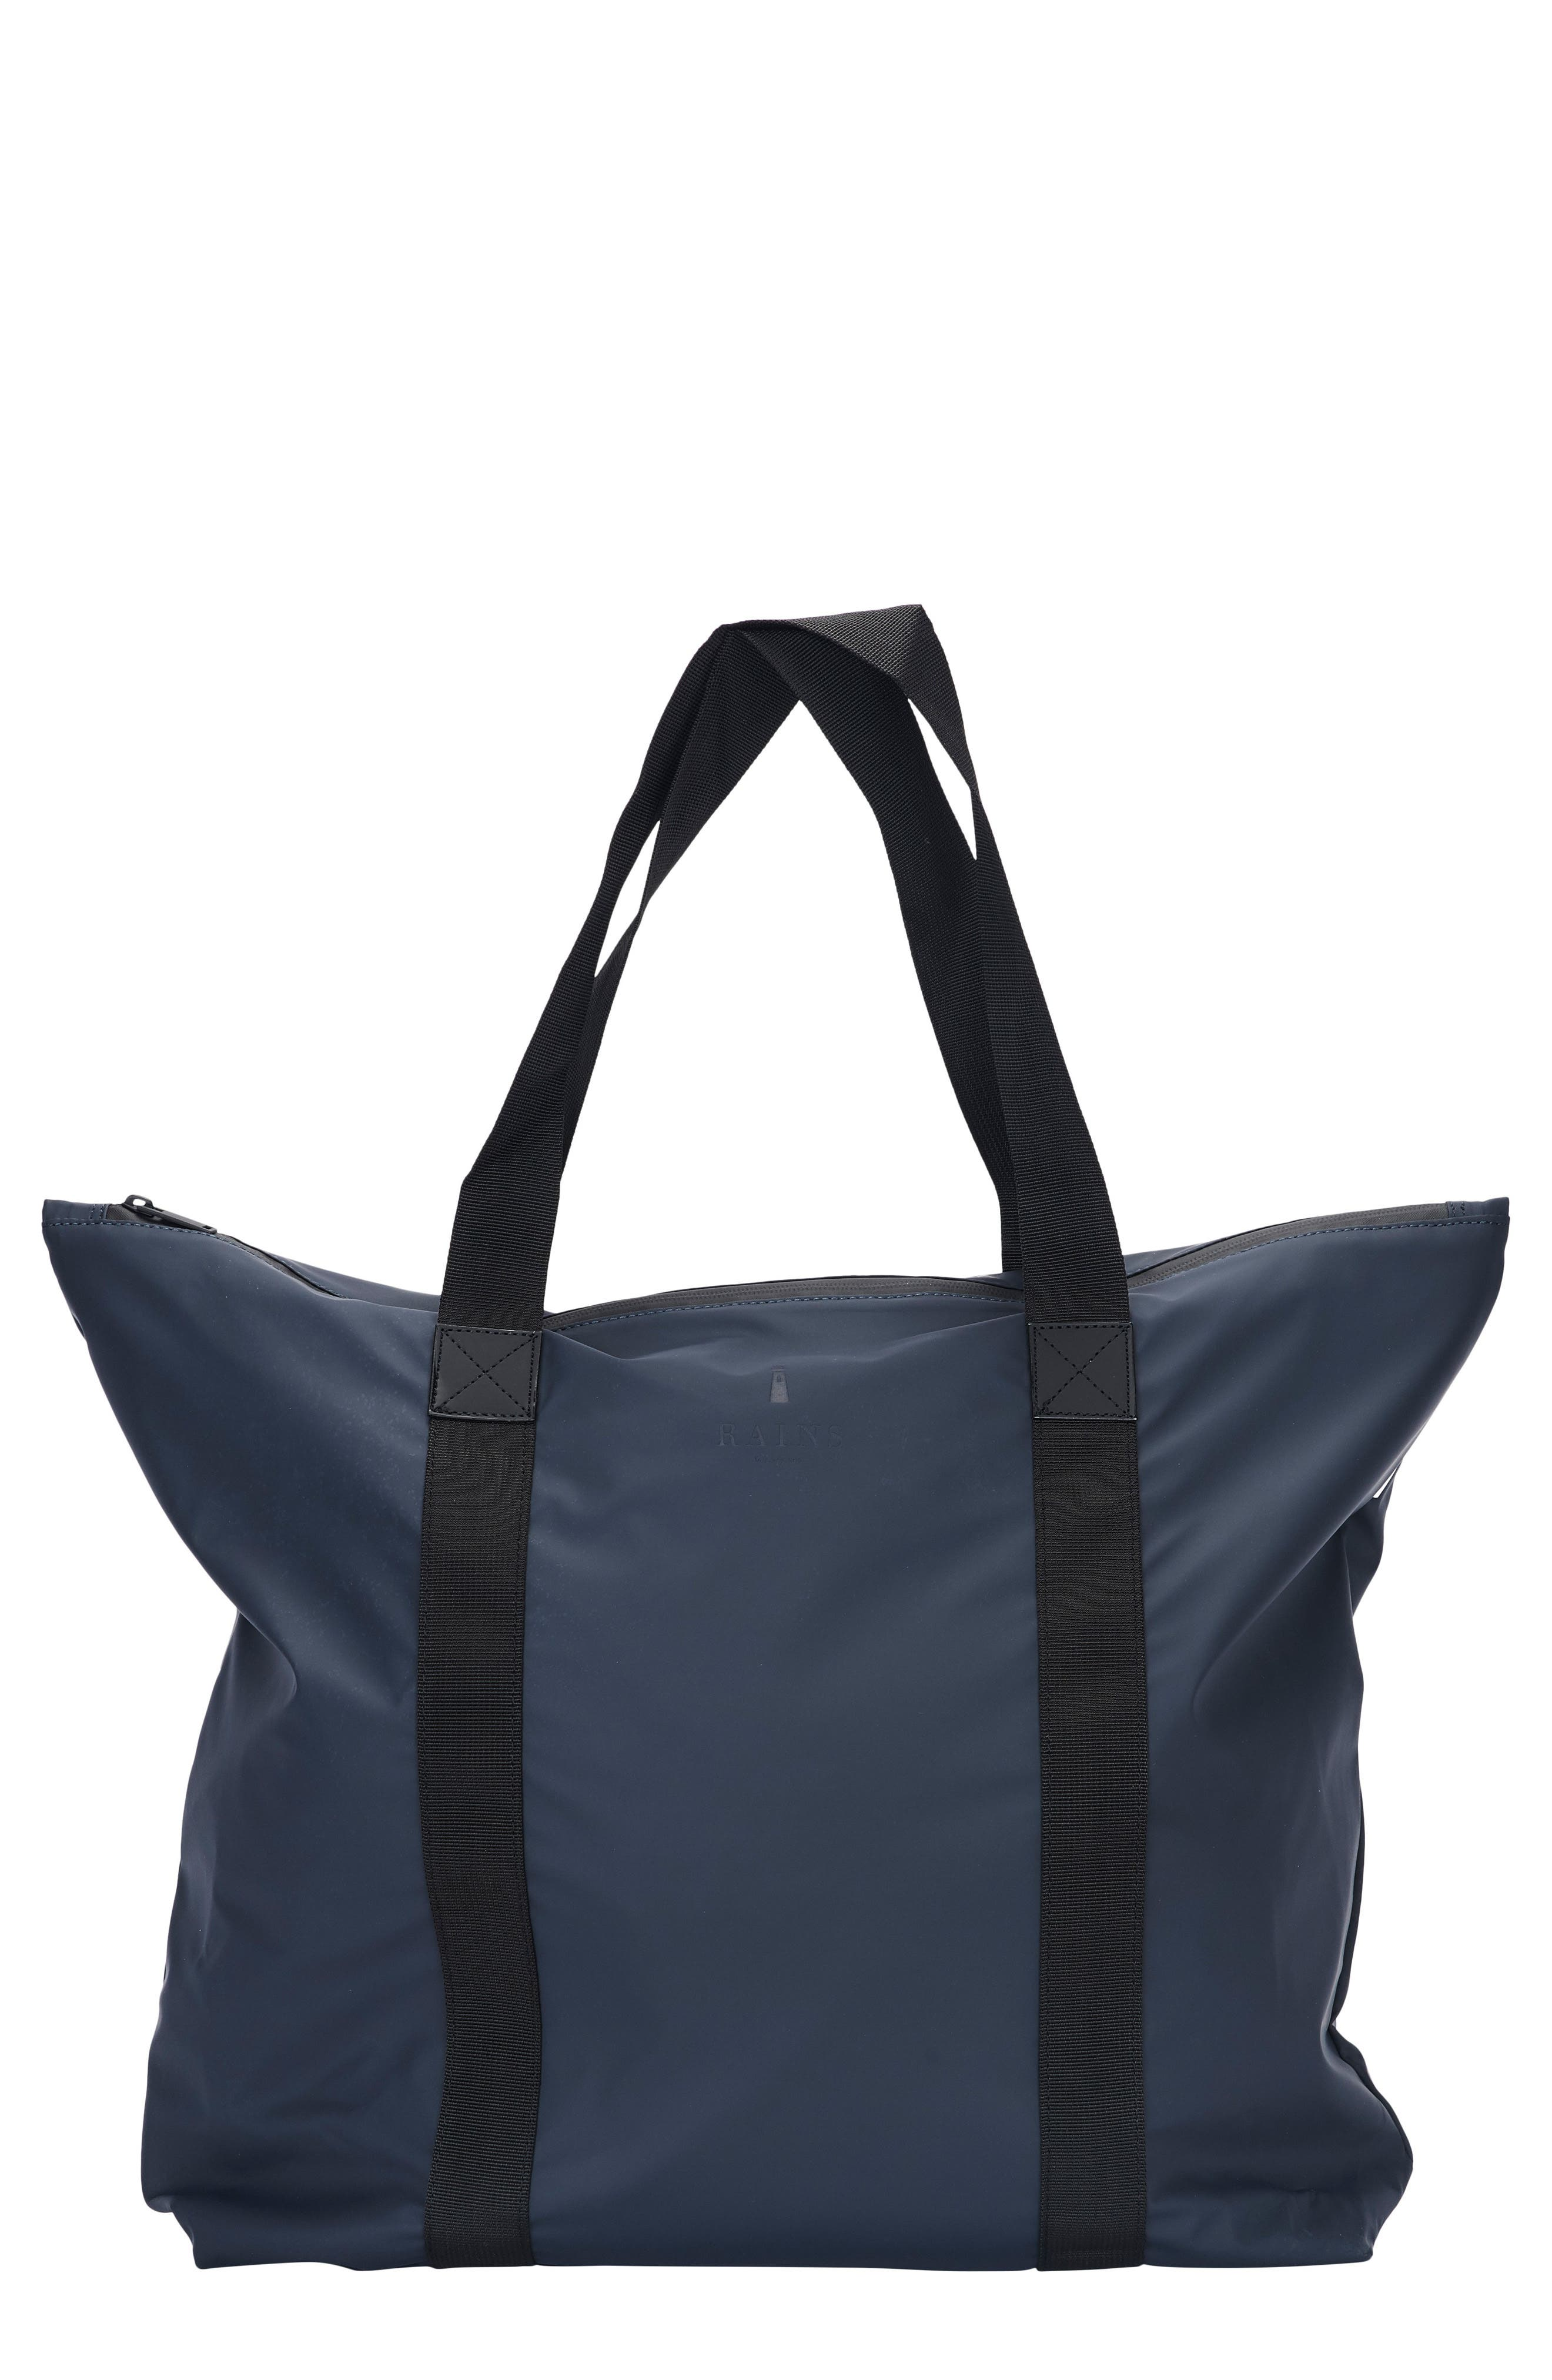 Waterproof Tote Bag,                         Main,                         color, Blue